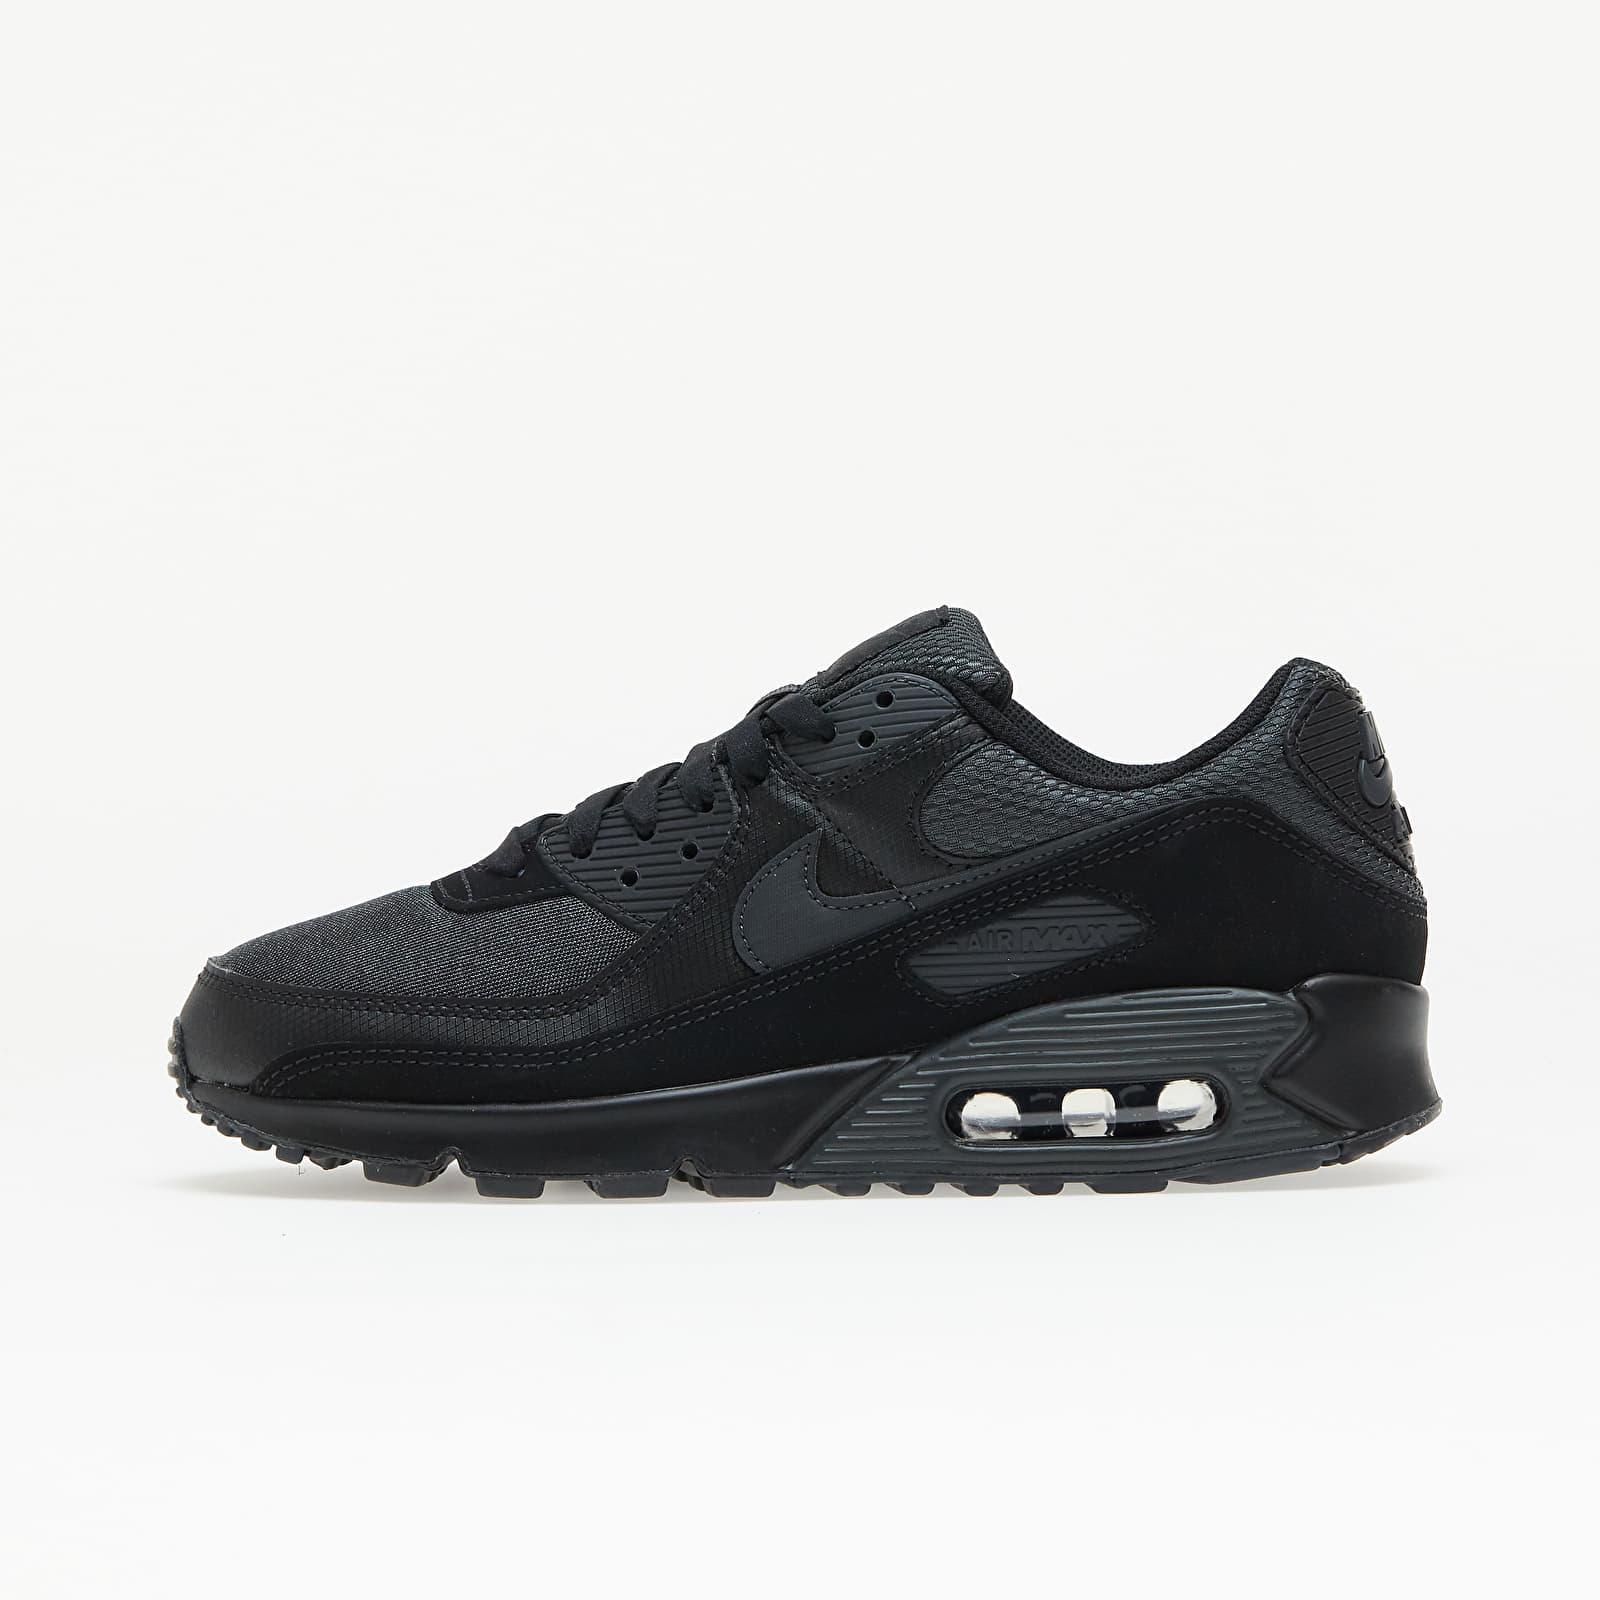 Nike Air Max 90 Black/ Dk Smoke Grey-Black EUR 41